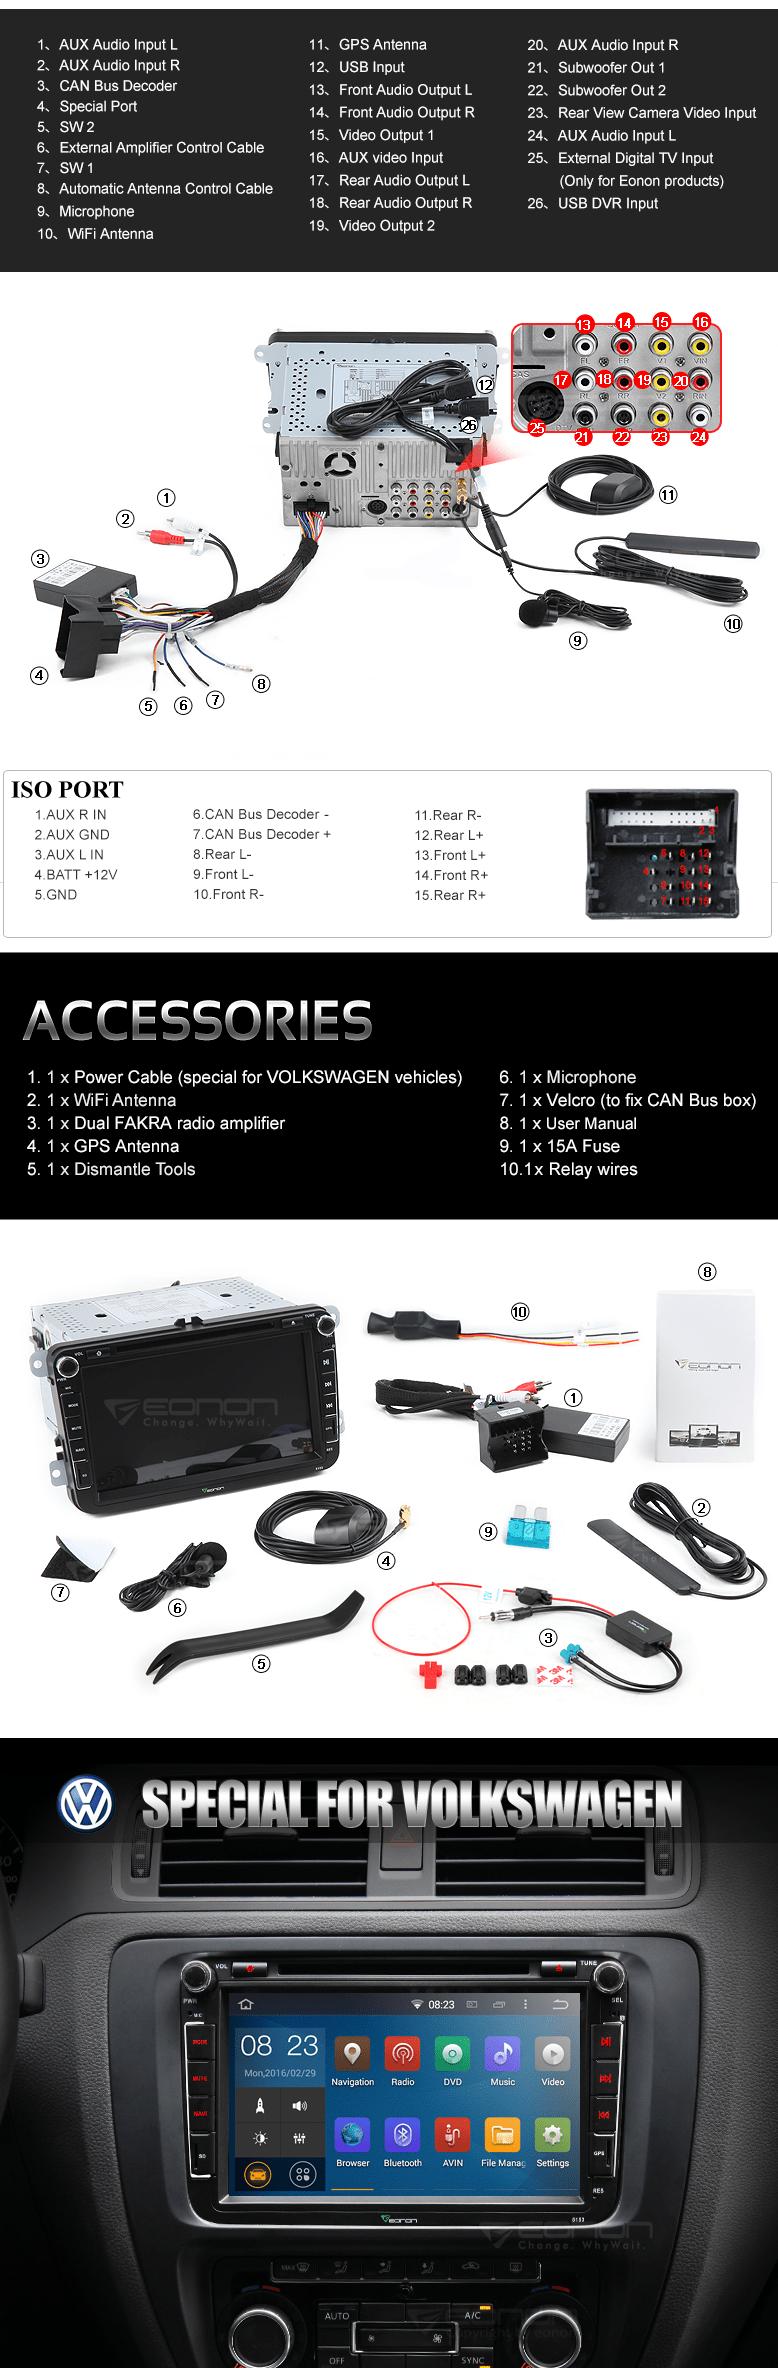 medium resolution of eonon reverse camera wiring diagram wiring libraryeonon reverse camera wiring diagram